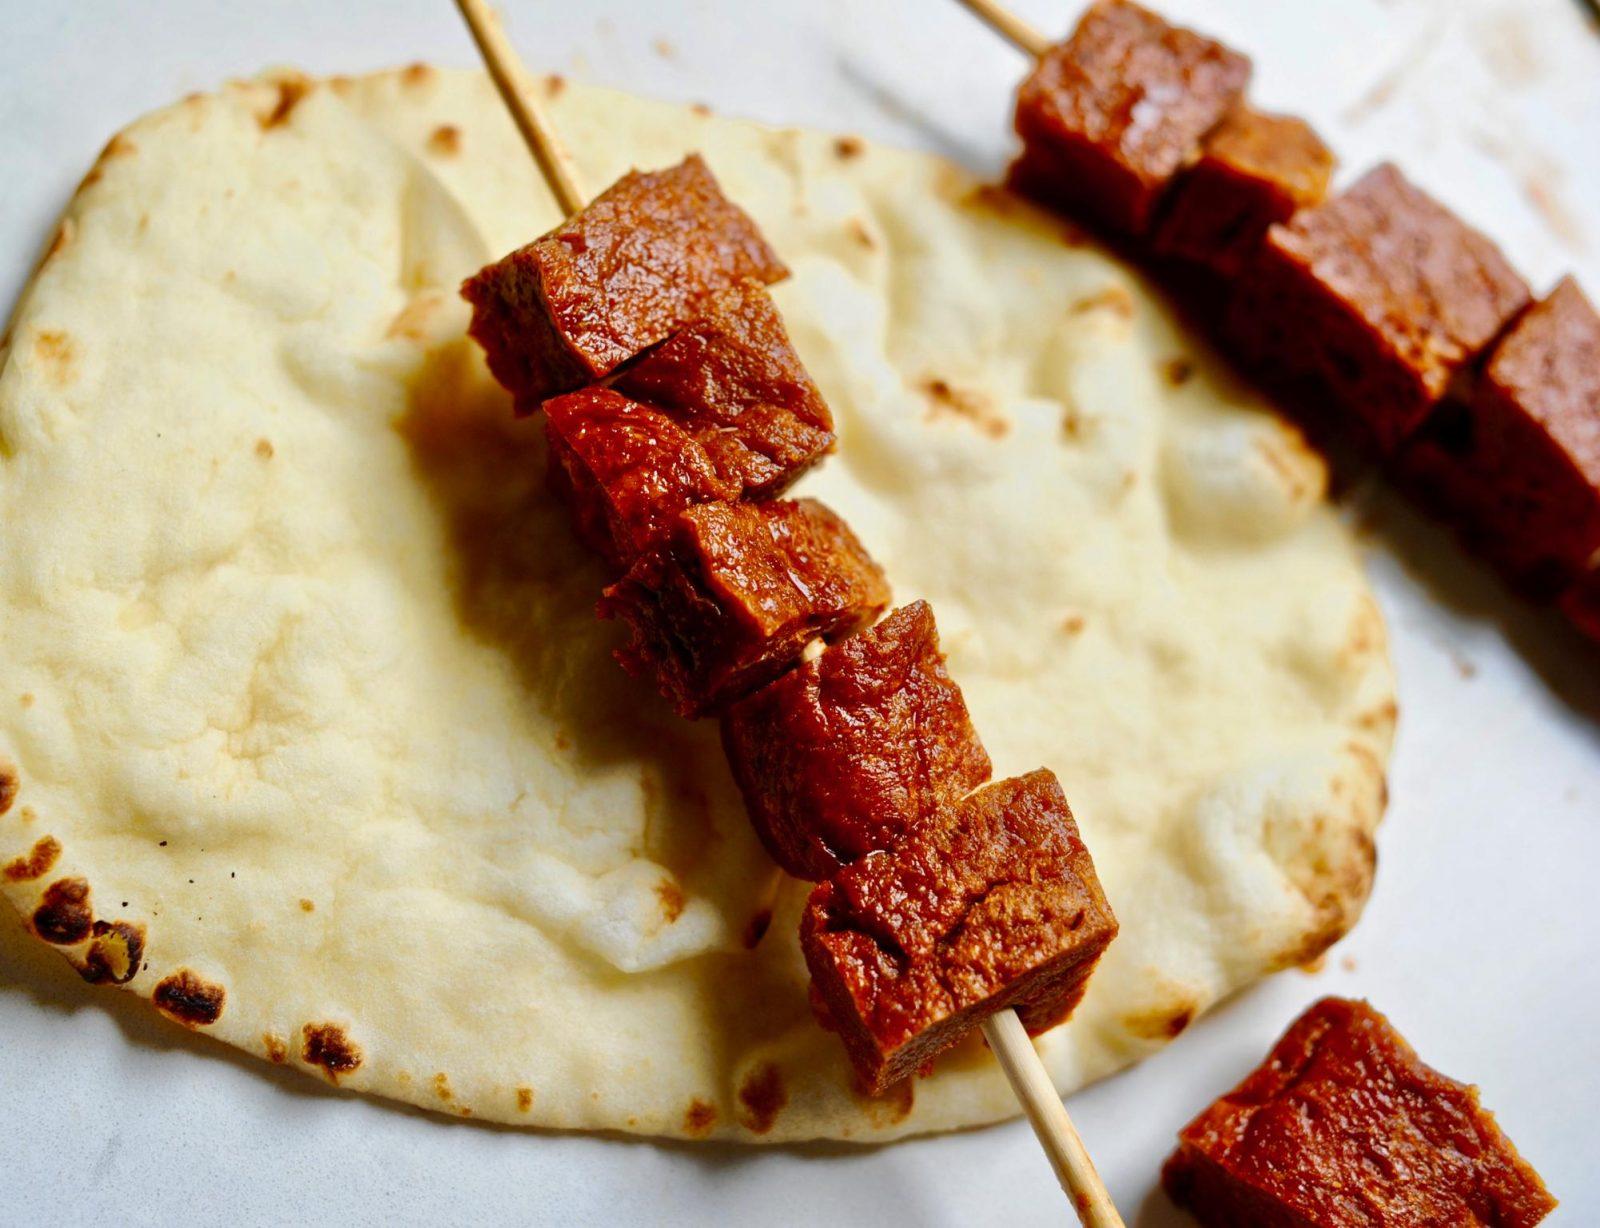 Vegan Souvlaki, (Greek Kebabs) with Cucumber Garlic Tzatziki Sauce